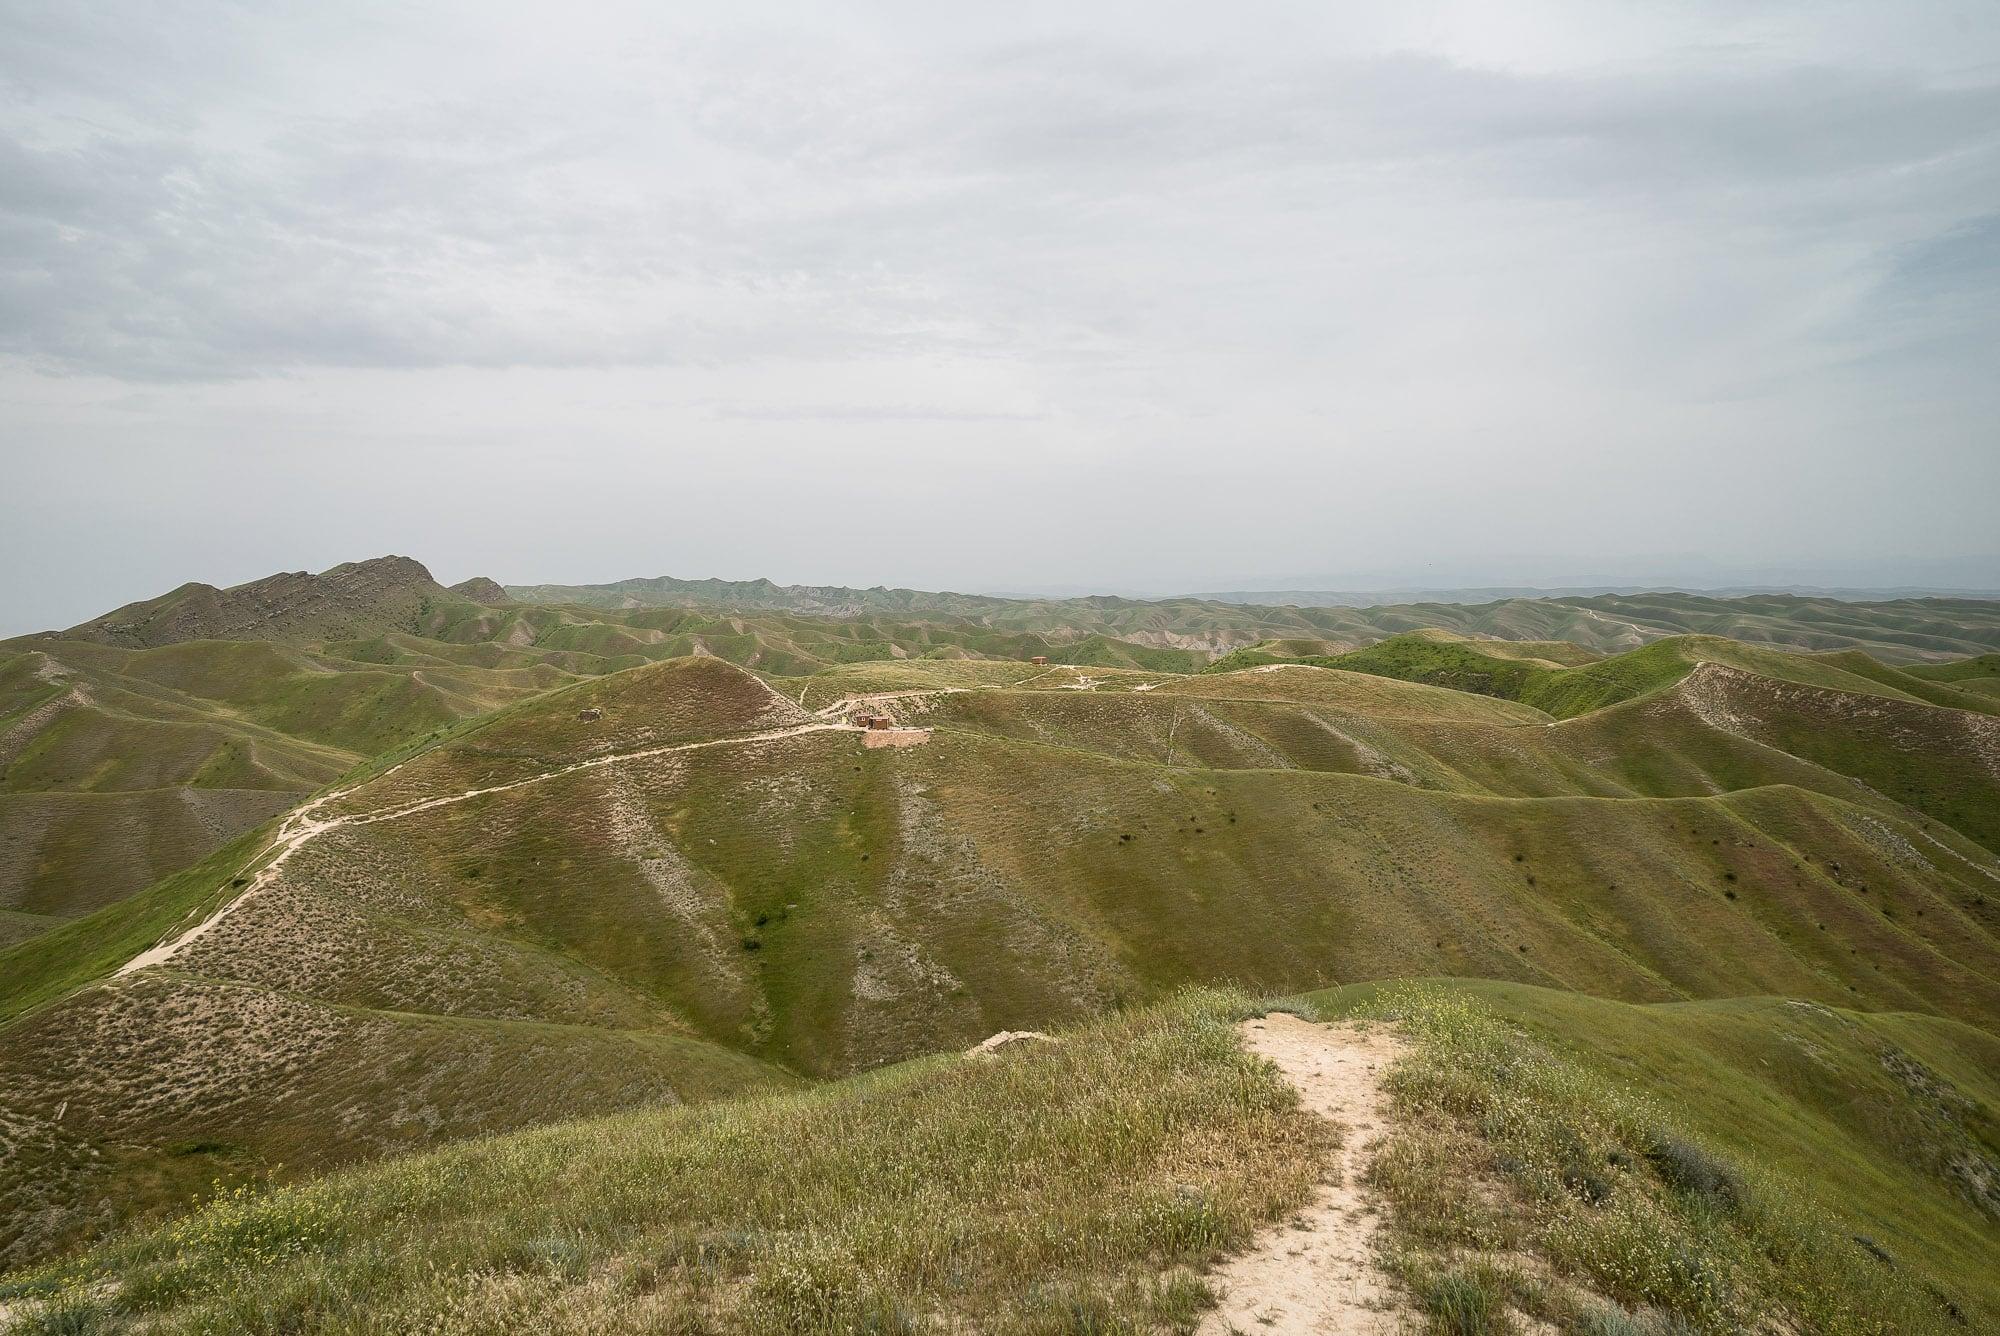 green hills of Khalid Nabi